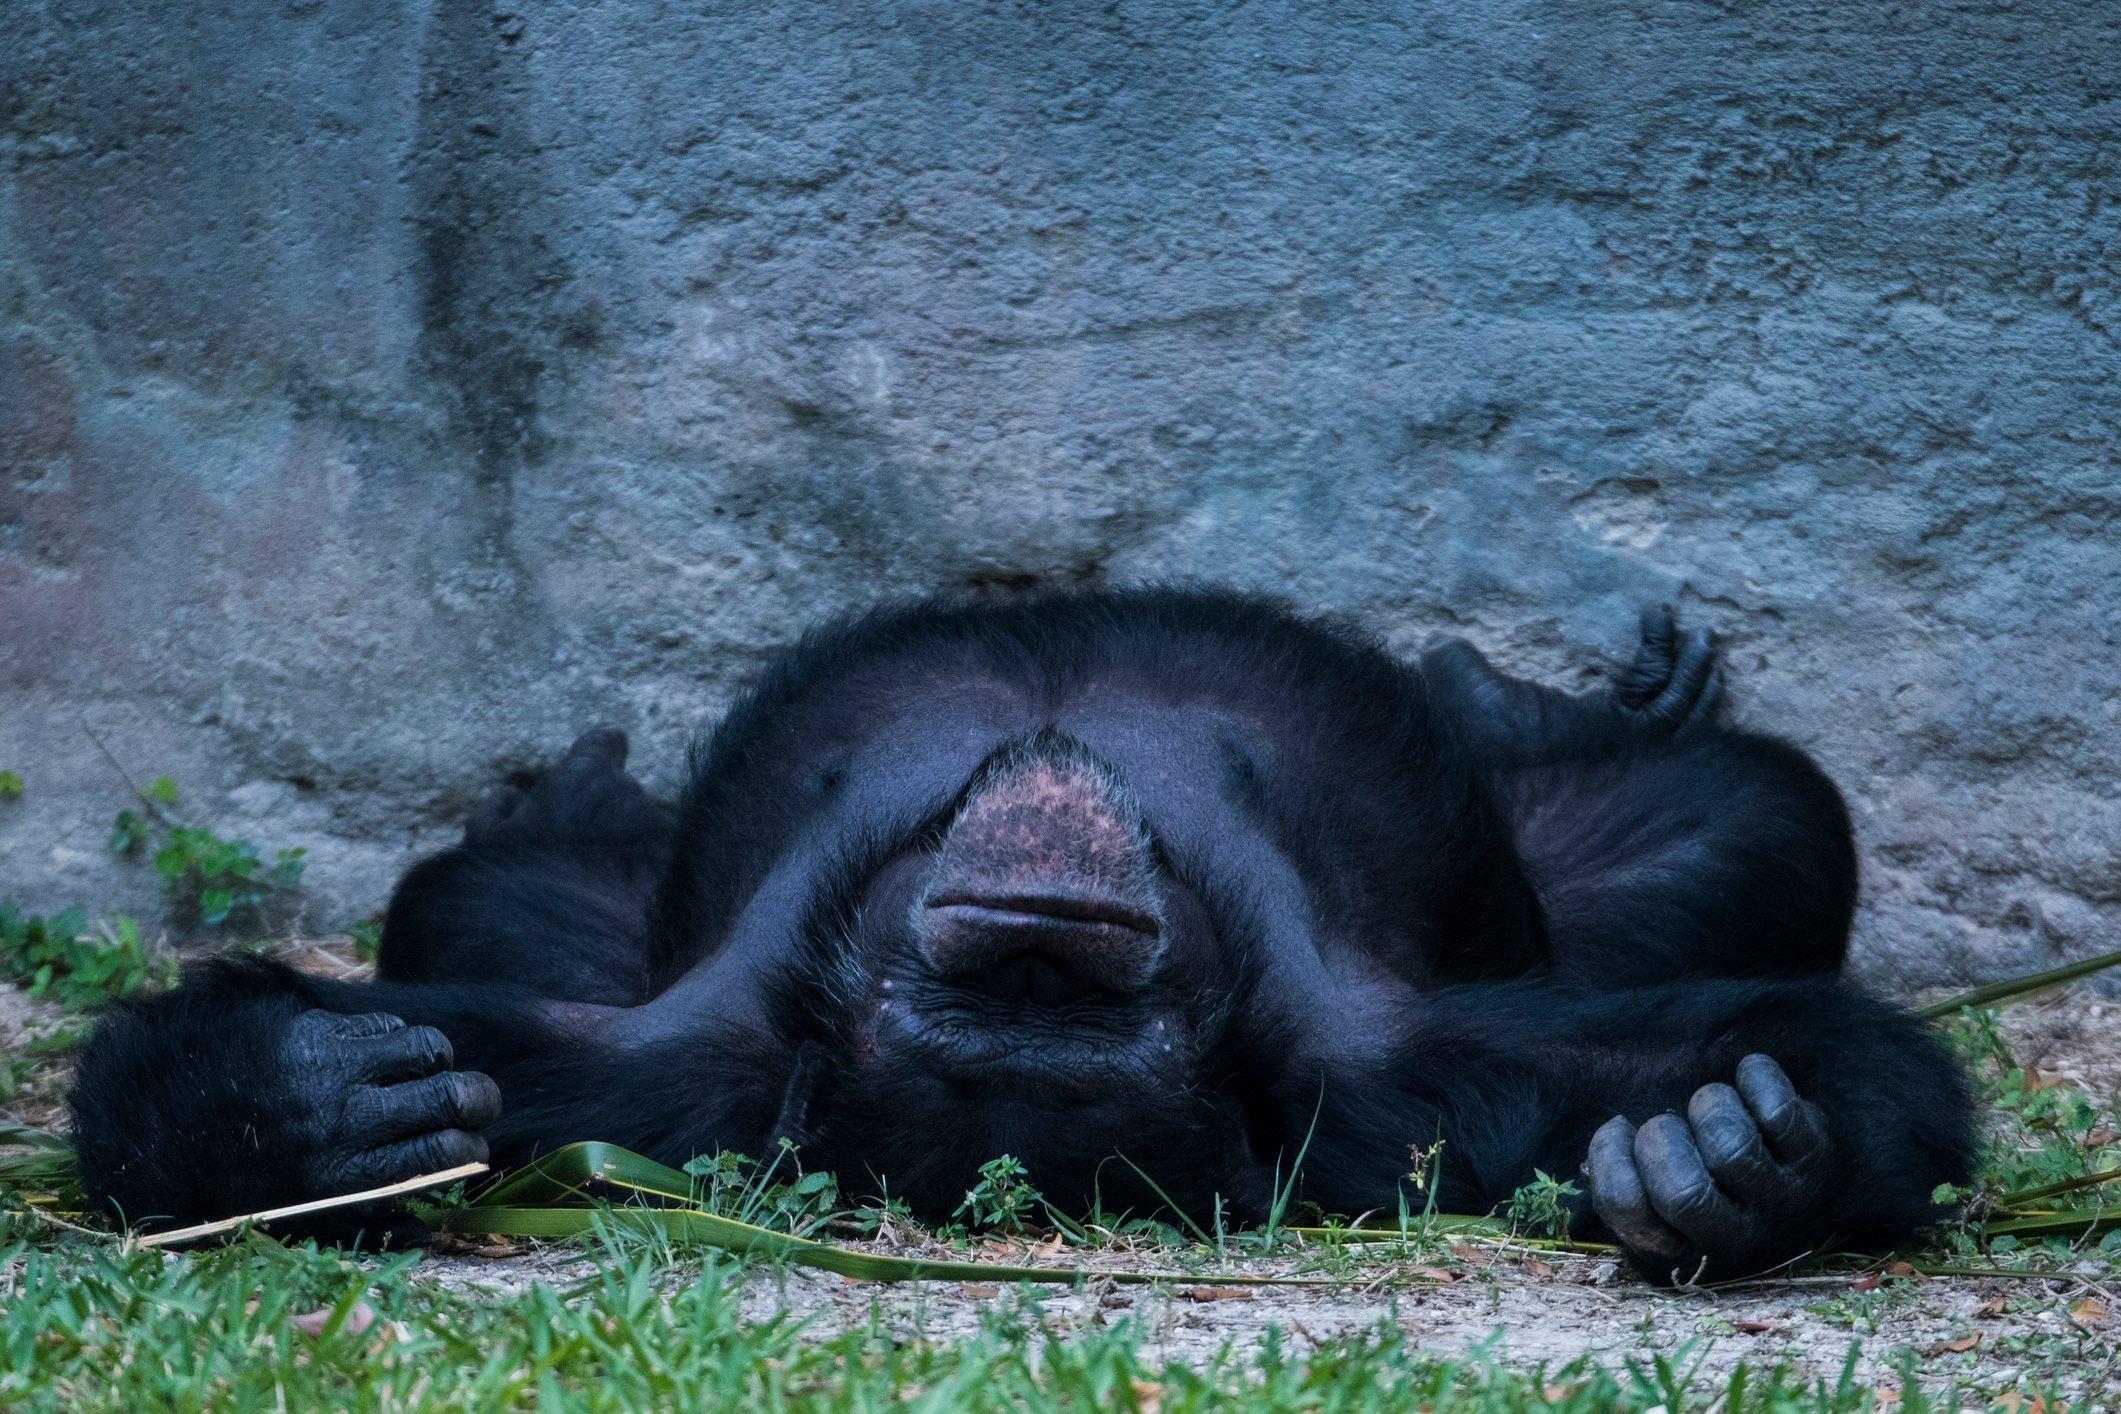 Chimpanzee sleeping on ground